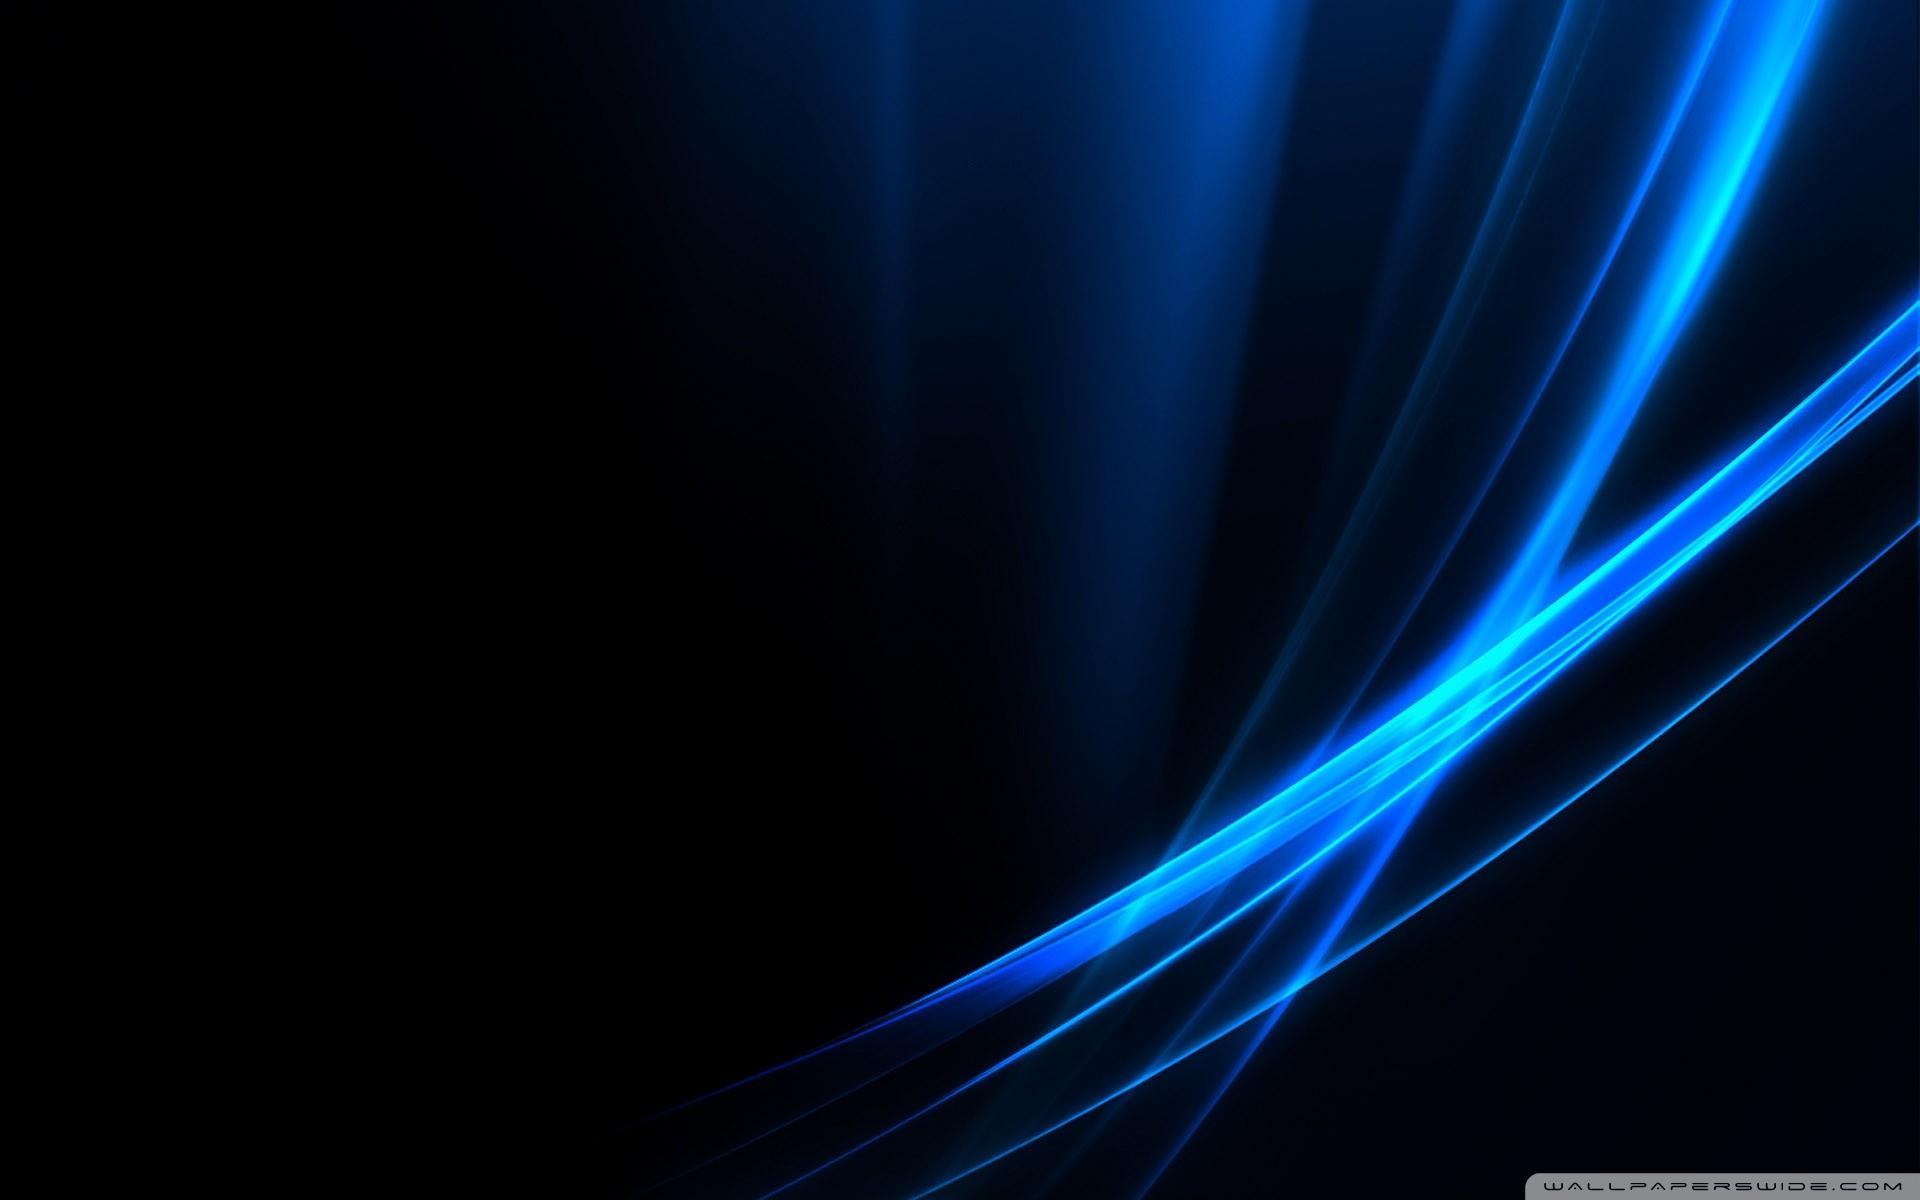 2560x1440 Wallpaper Windows 10 (73+ images)